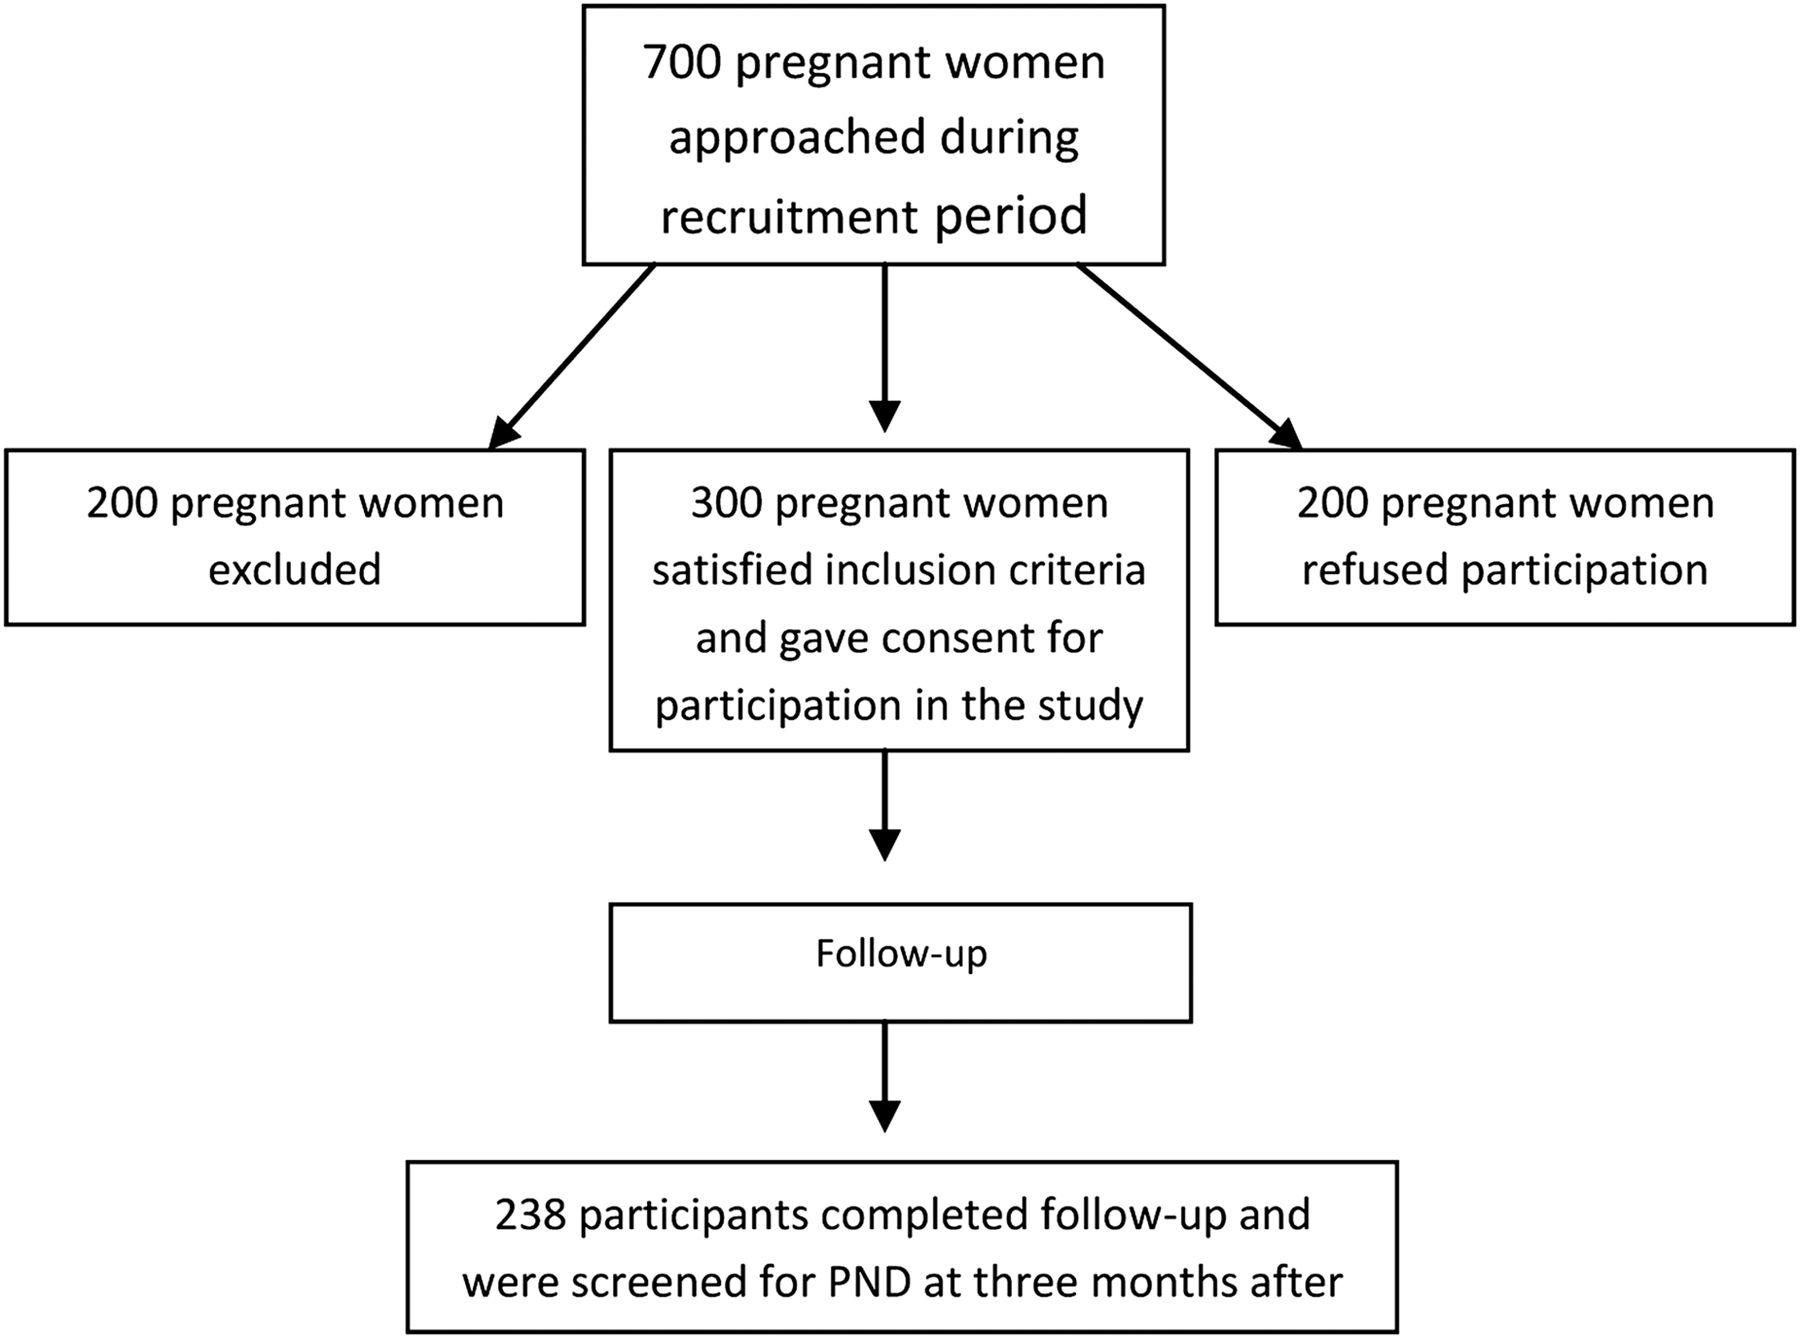 Prenatal and Postnatal Determinants of Development